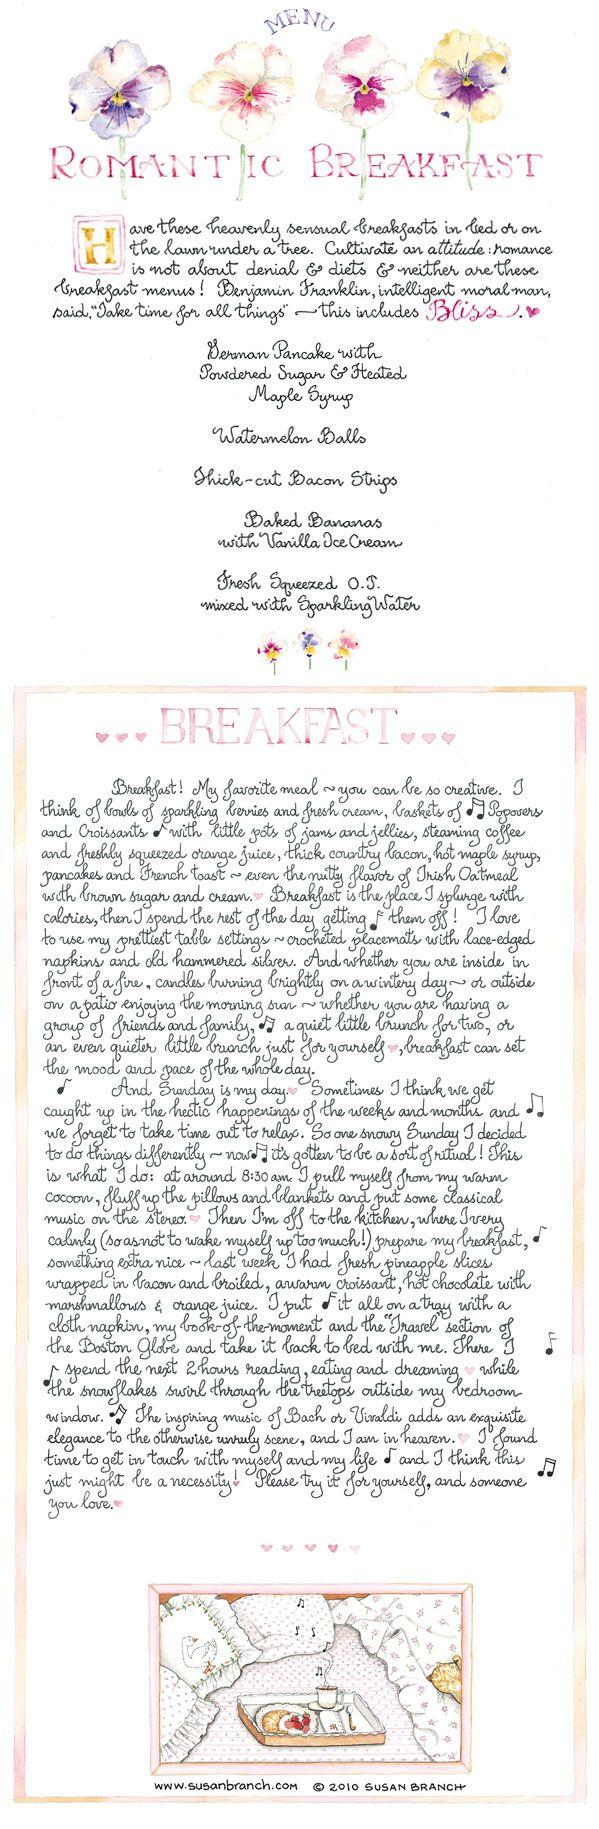 Breakfast in Bed by Susan Branch